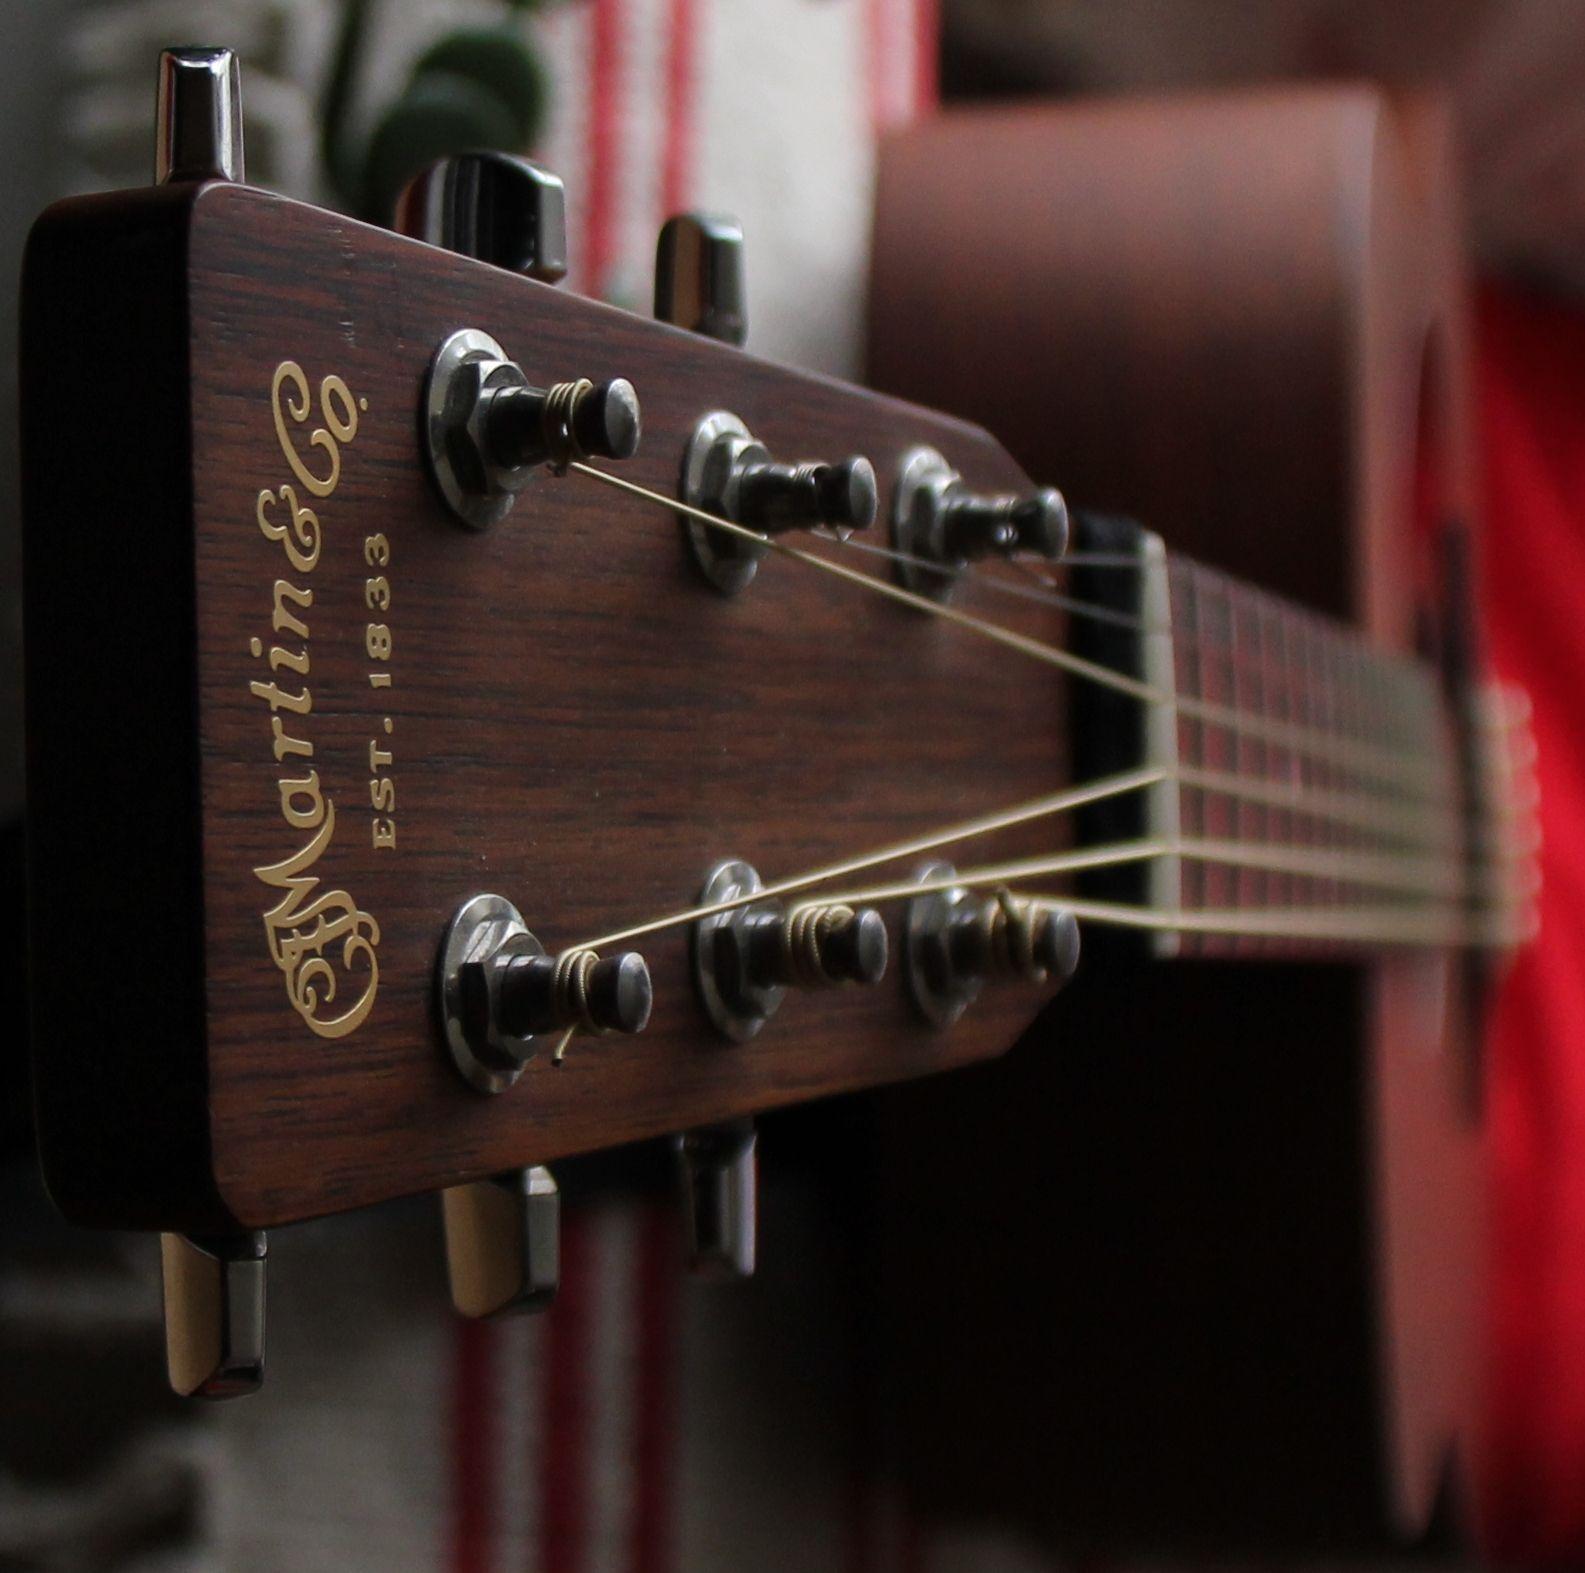 Martin Co D 15 Acoustic Guitar User Review Acoustic Guitar Martin Guitar Guitar